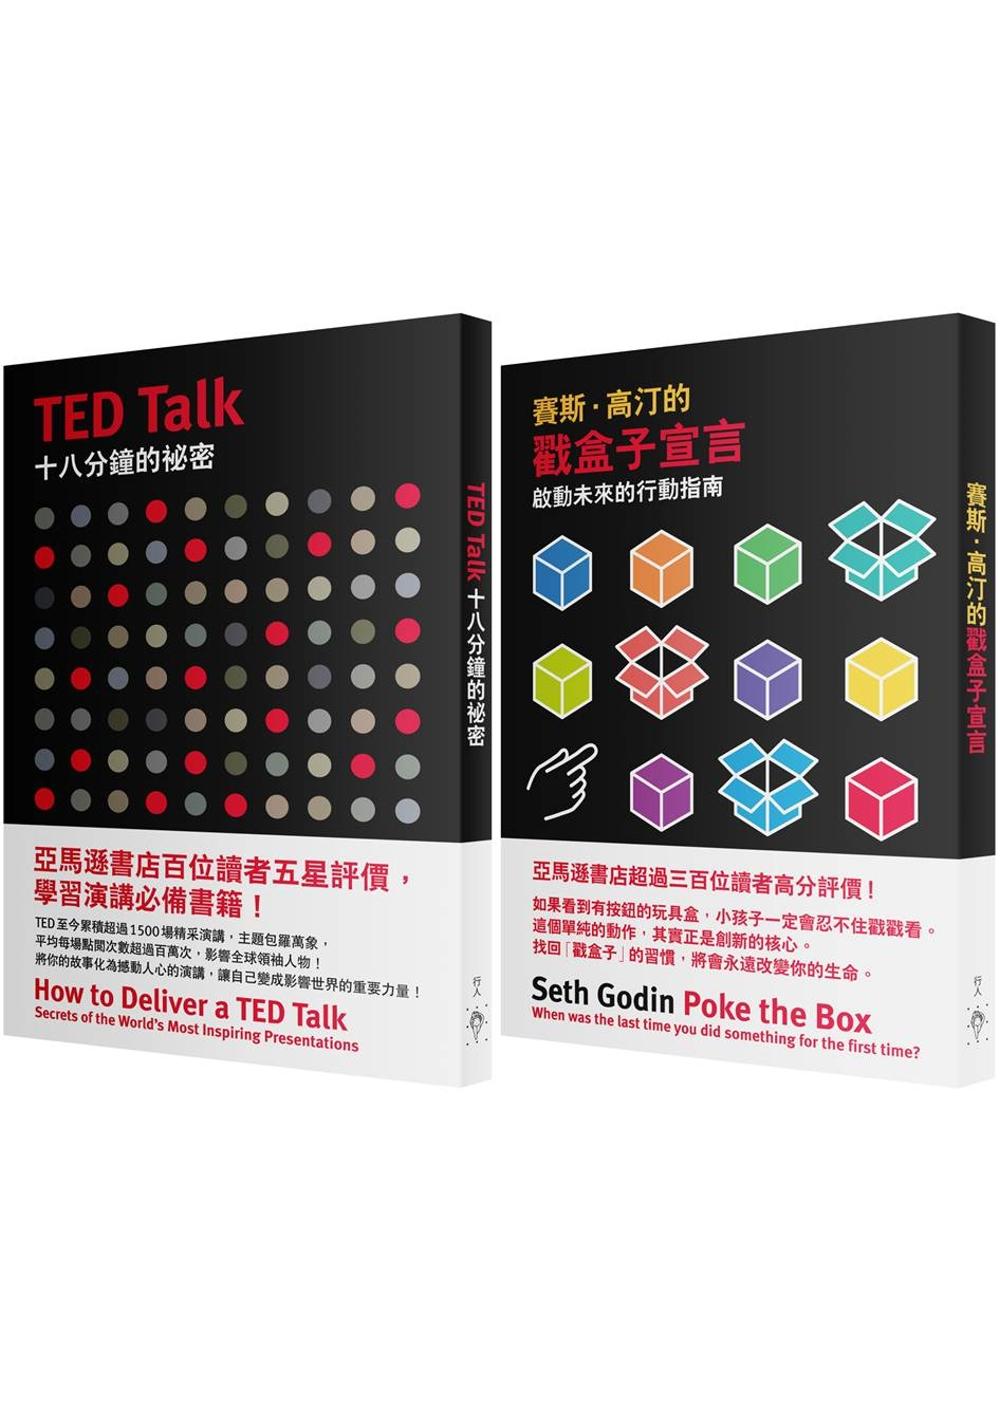 TED x 賽斯‧高汀:啟動未來的18分鐘 (套書)《TED Talk 十八分鐘的秘密》《塞斯‧高汀的戳盒子宣言:啟動未來的行動指南》